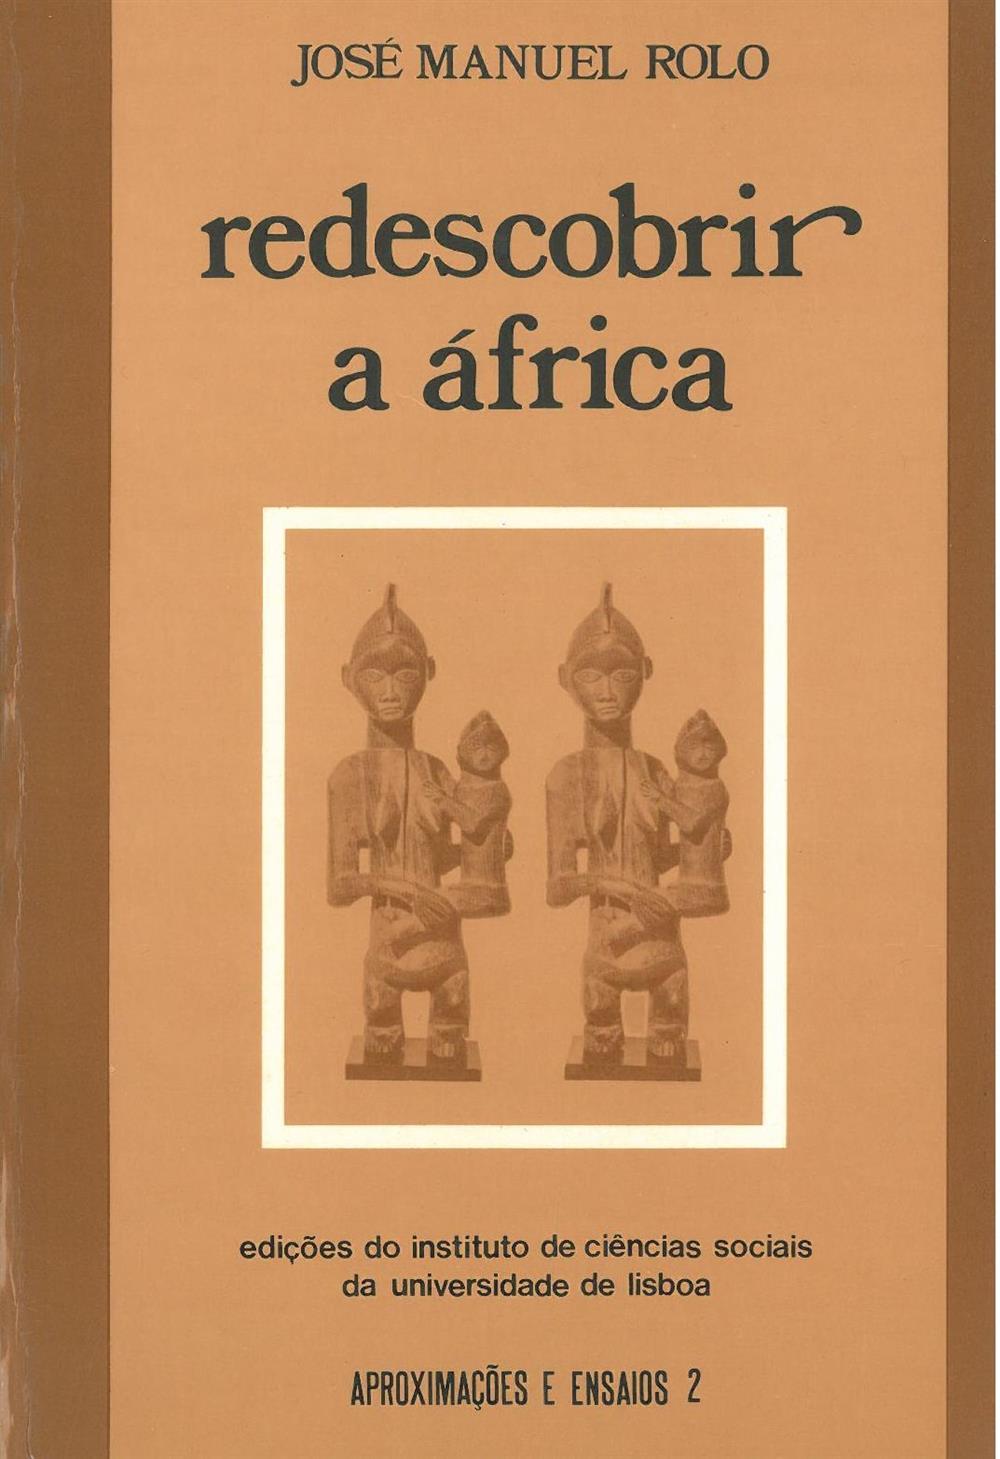 Redescobrir a África.jpg